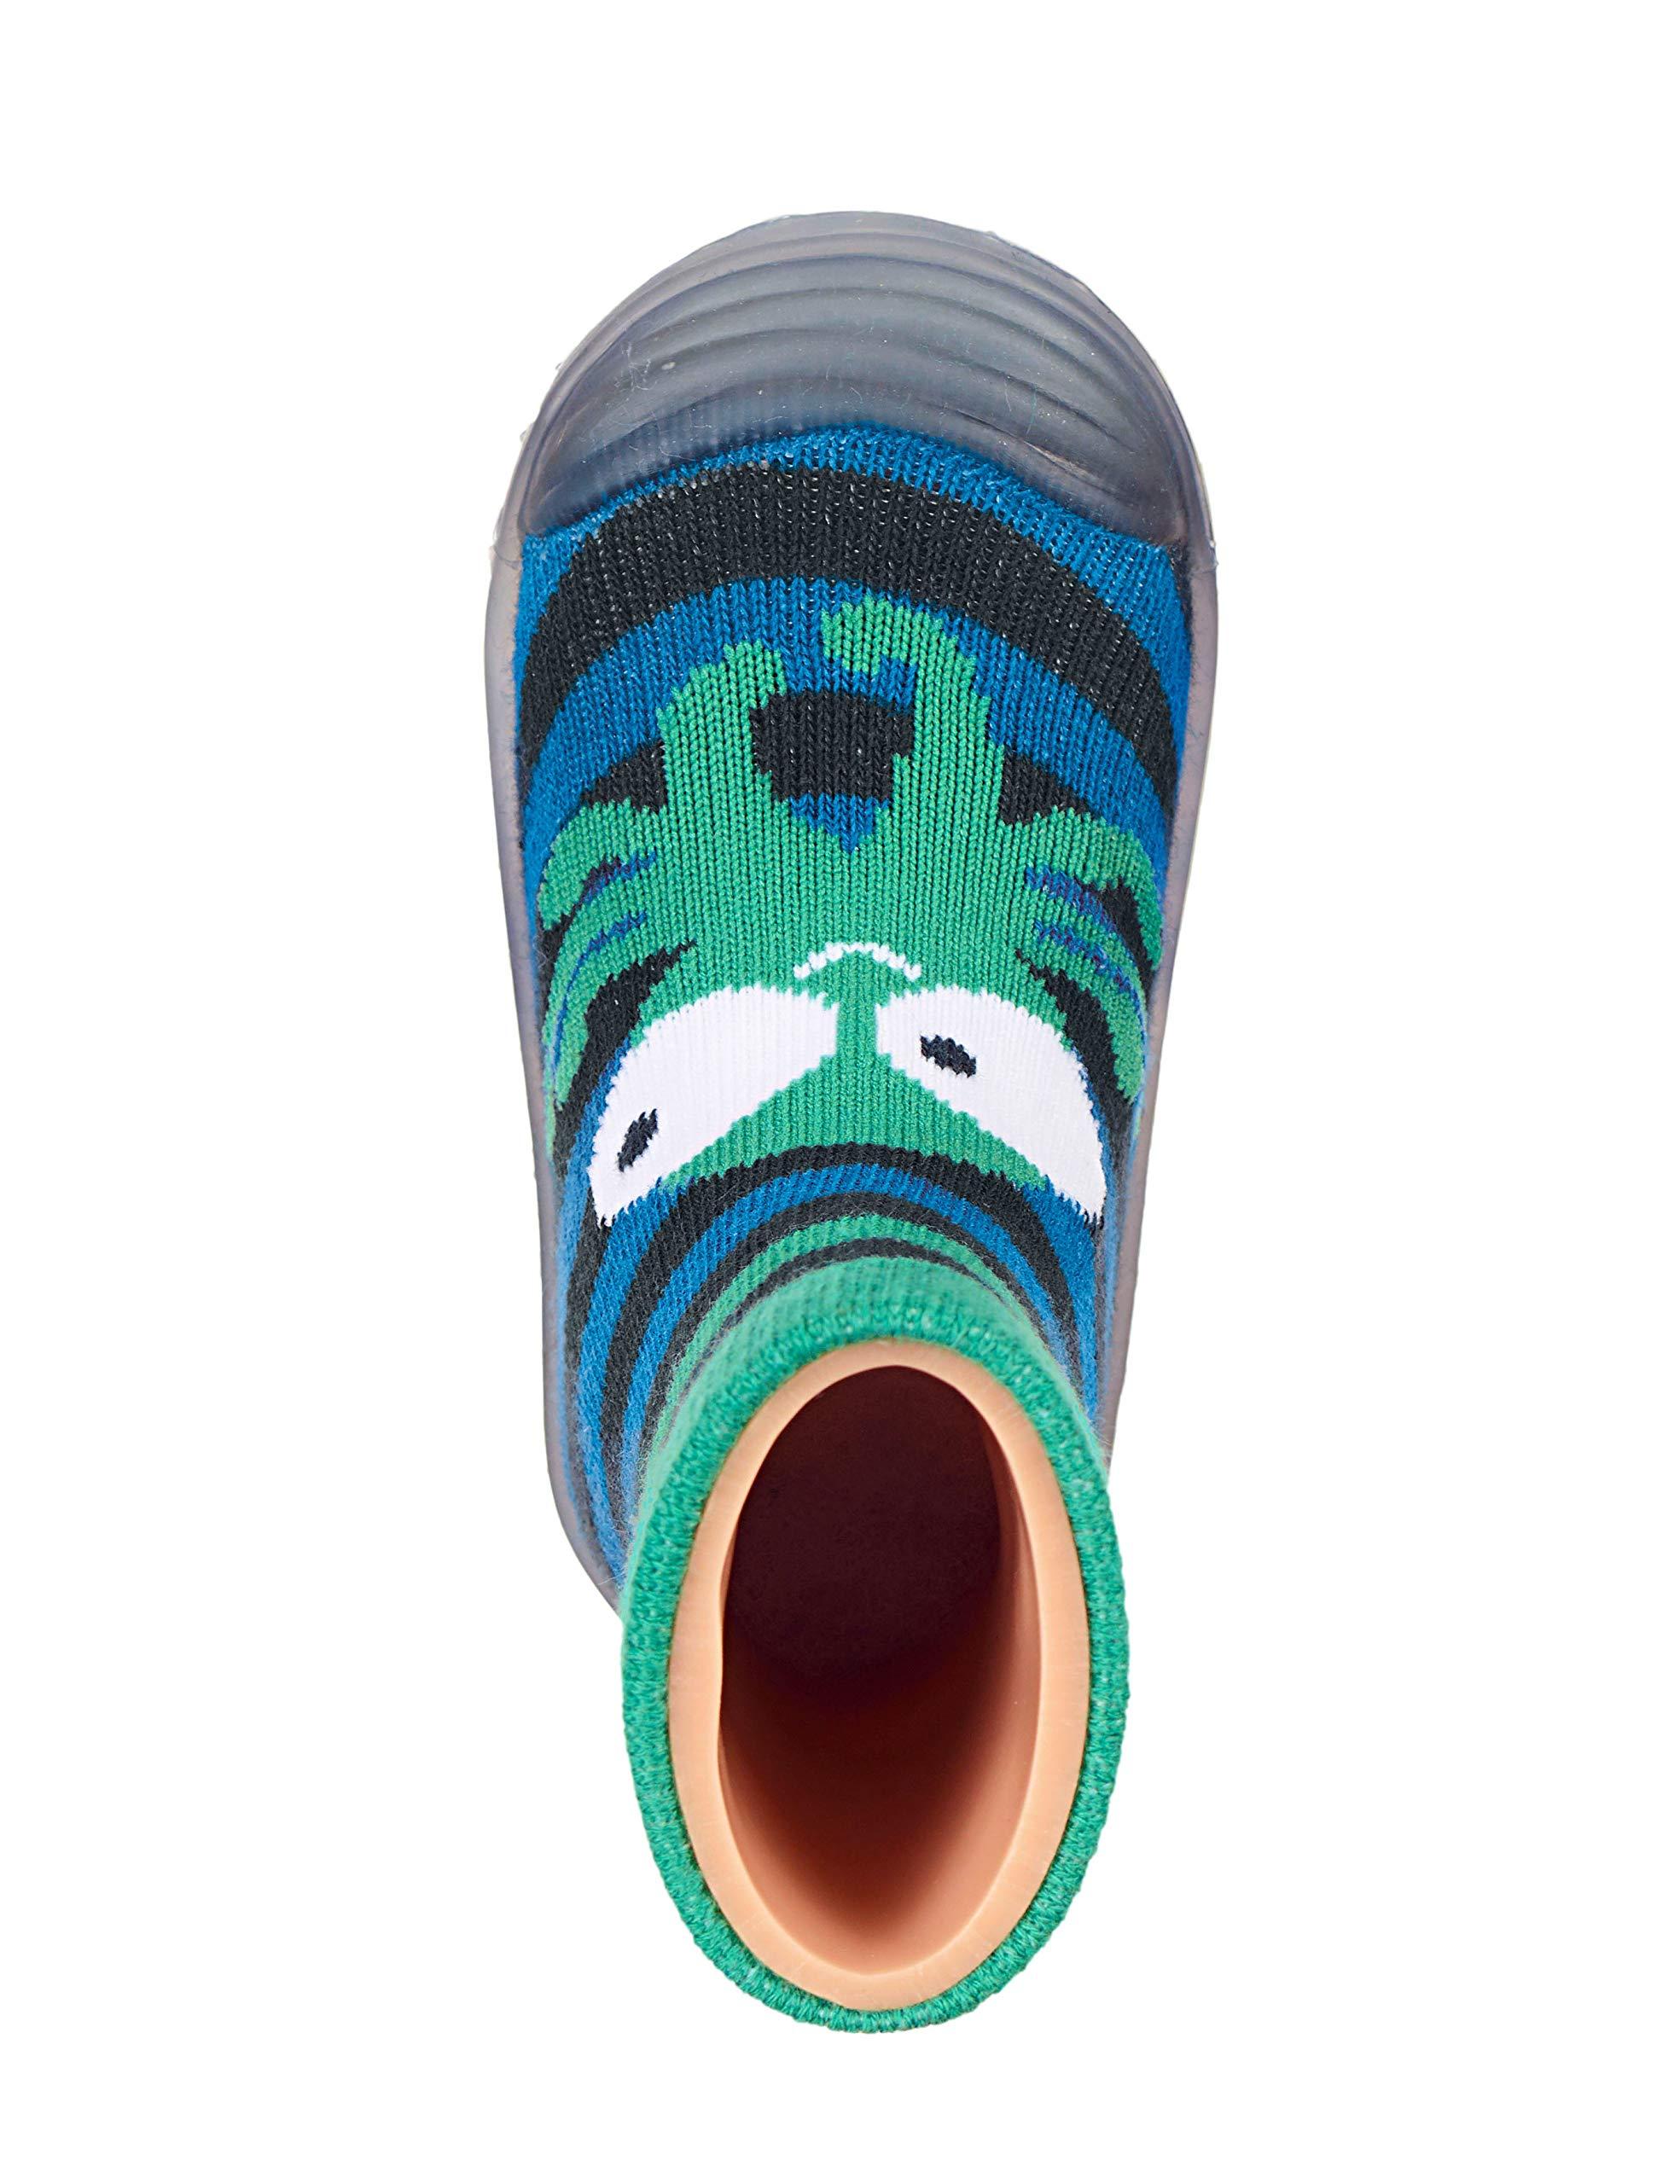 Sterntaler Adventure-Socks Qualle, Zapatillas Impermeables para Niños 5